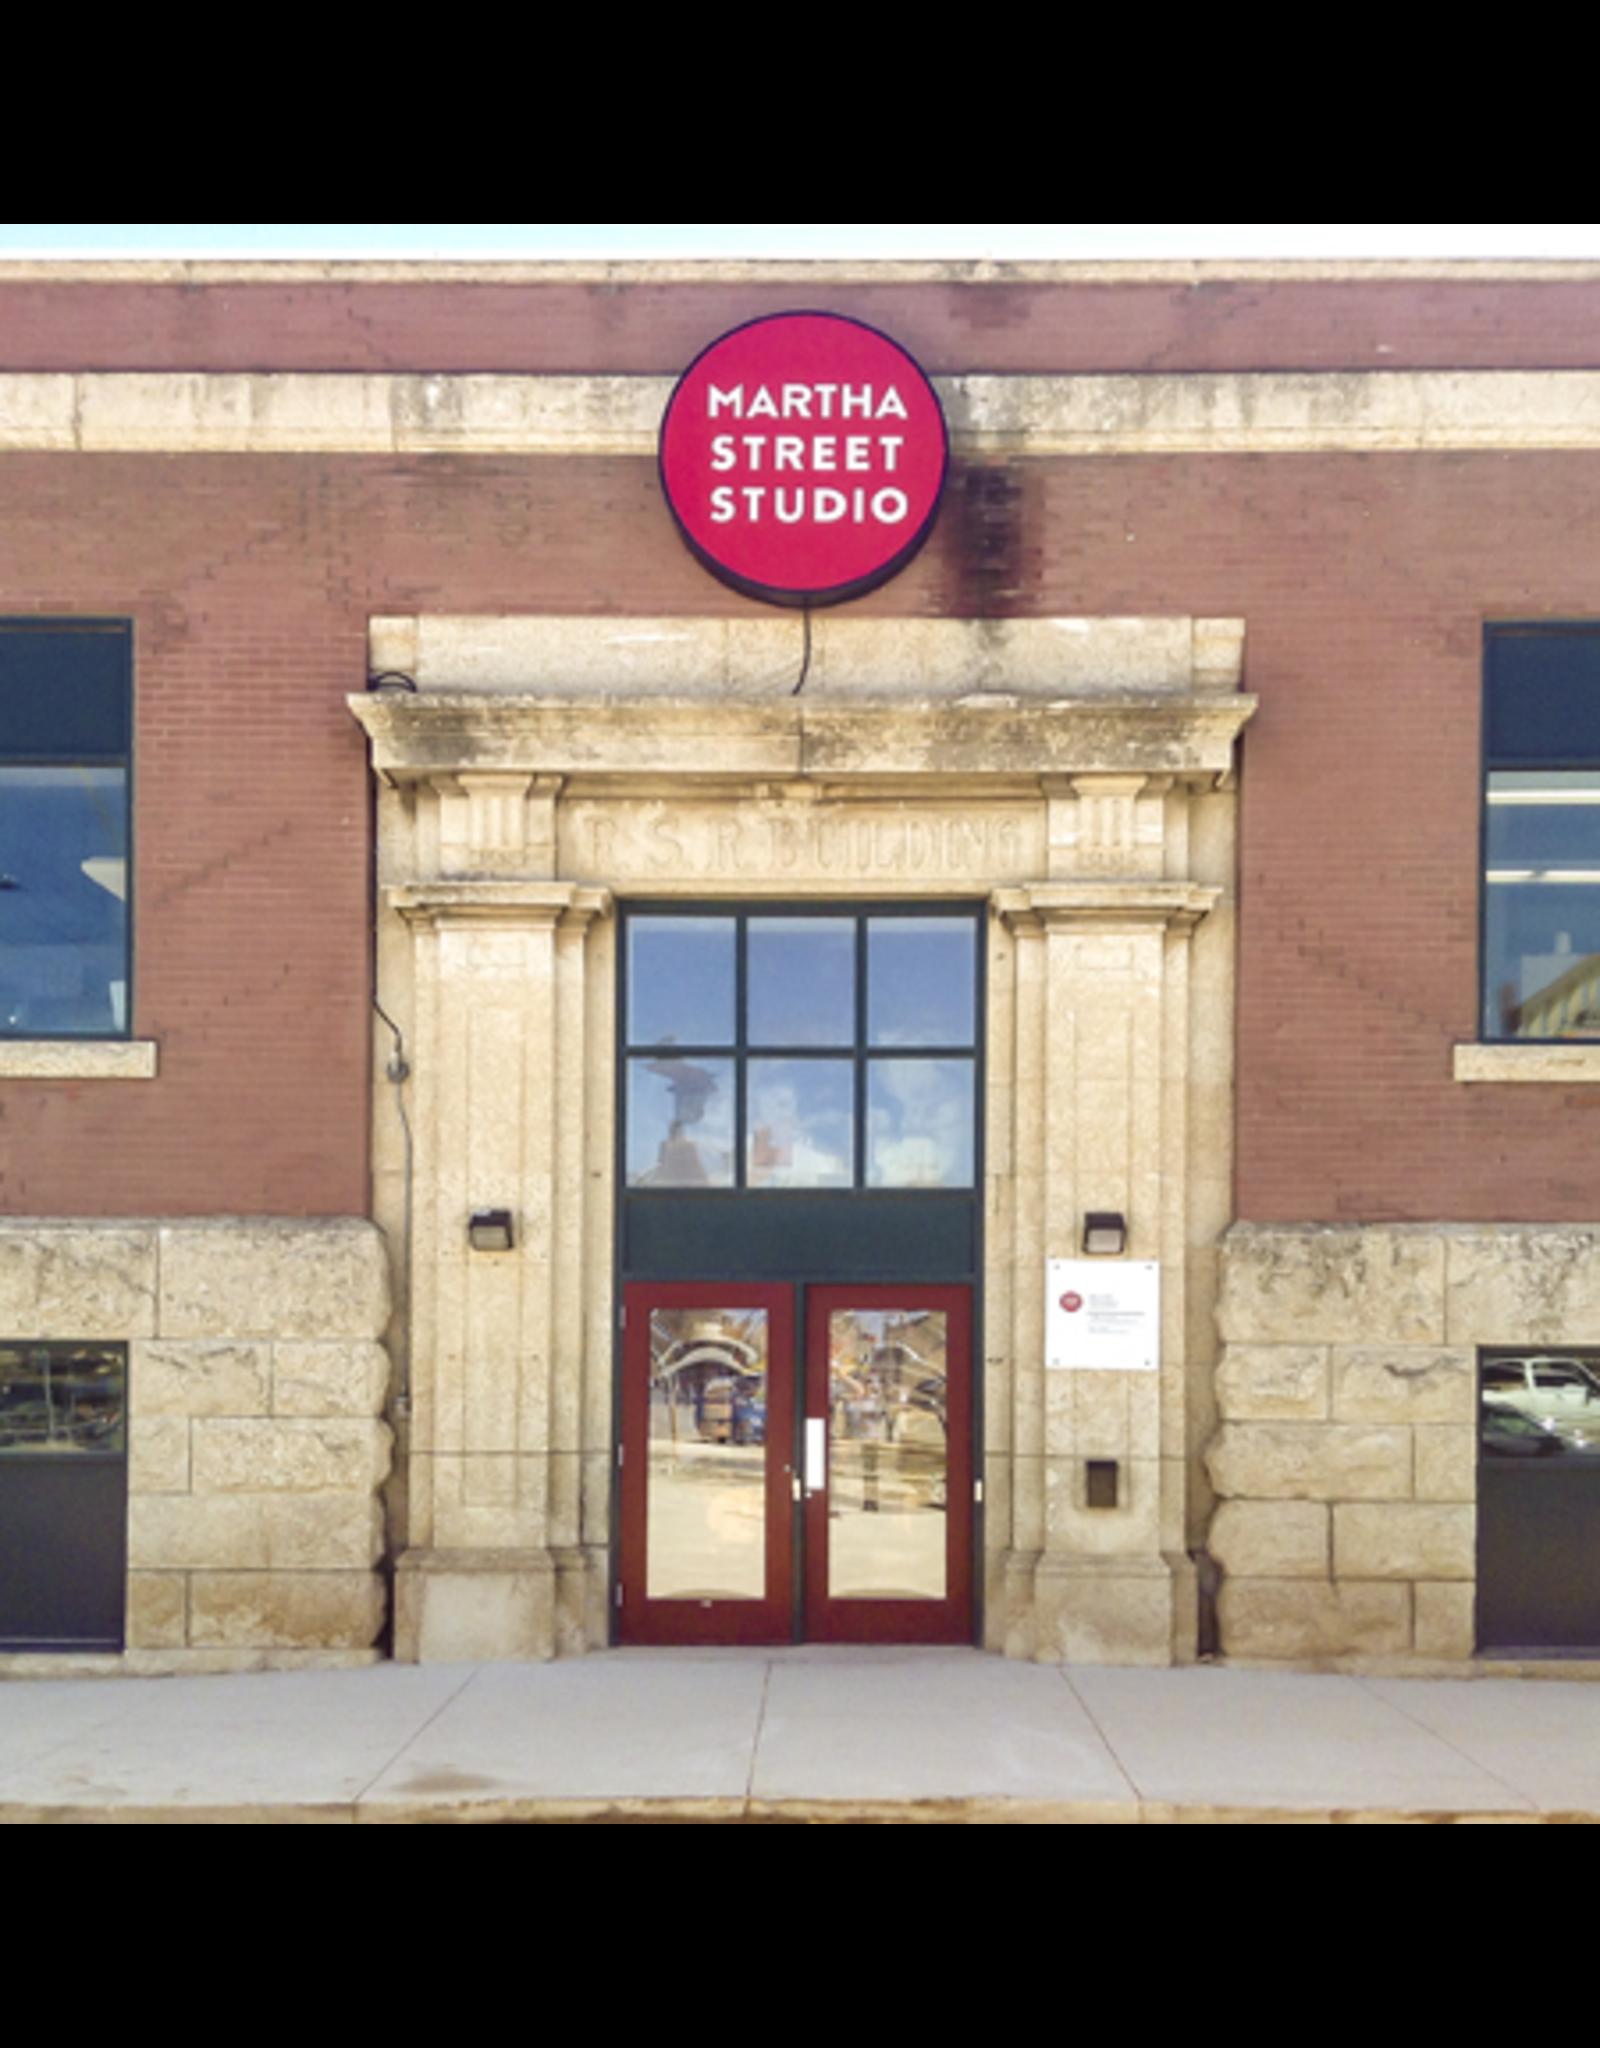 Martha Street Studio 1 year membership - Seniors, Students, Low Income